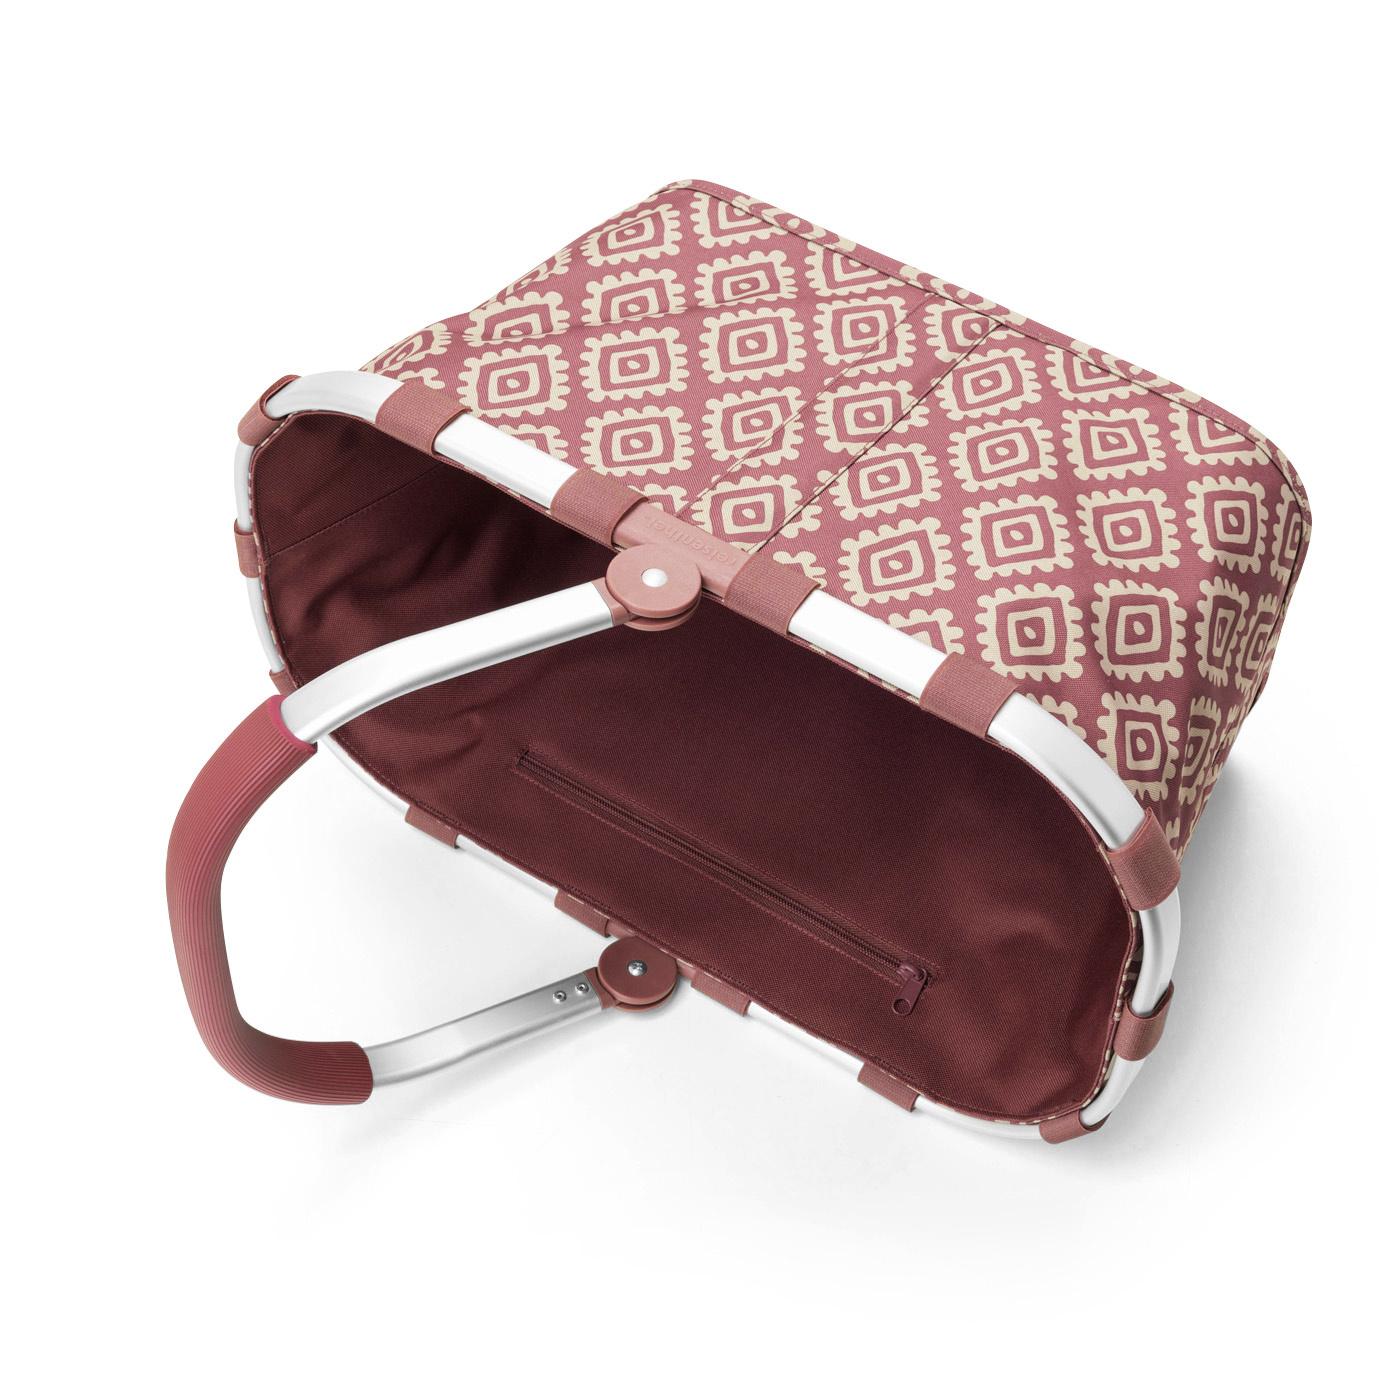 Reisenthel Einkaufskorb Carrybag Diamonds Rouge